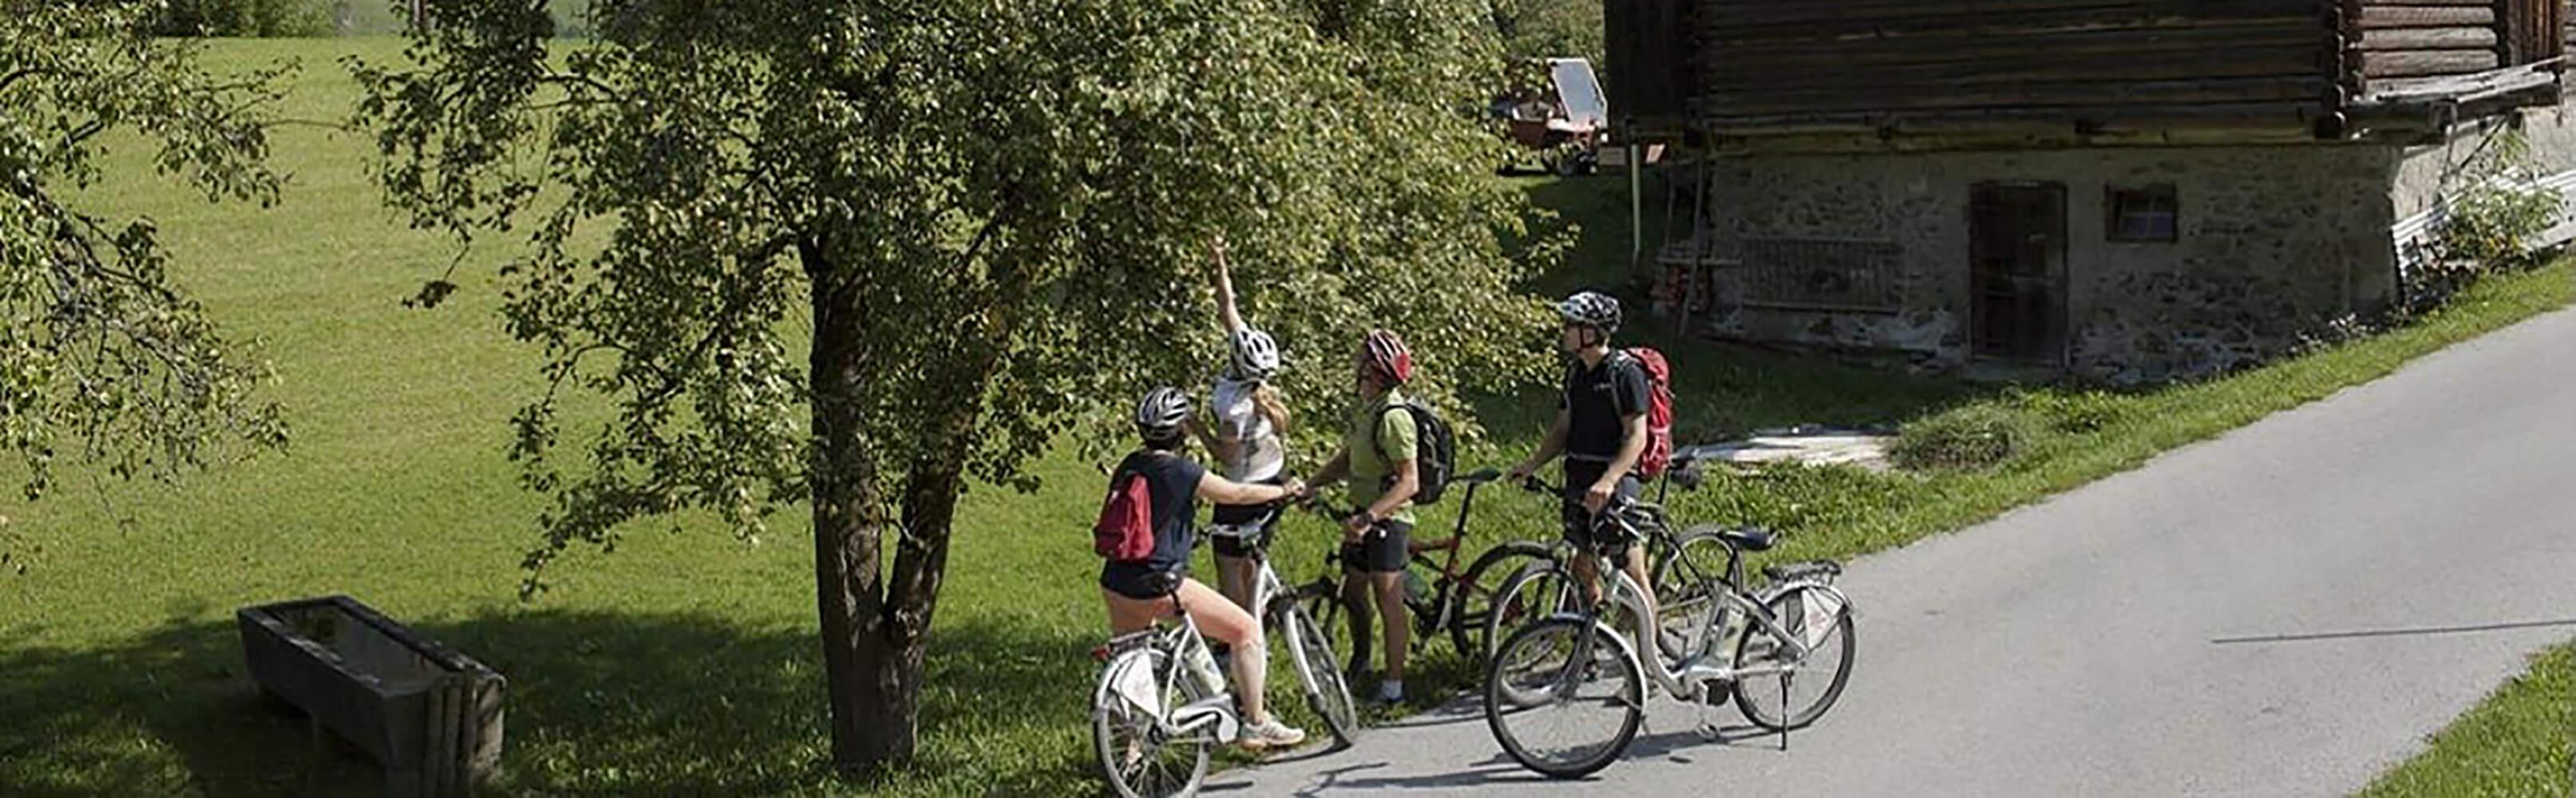 Tirol - Genuss-Radfahren 1